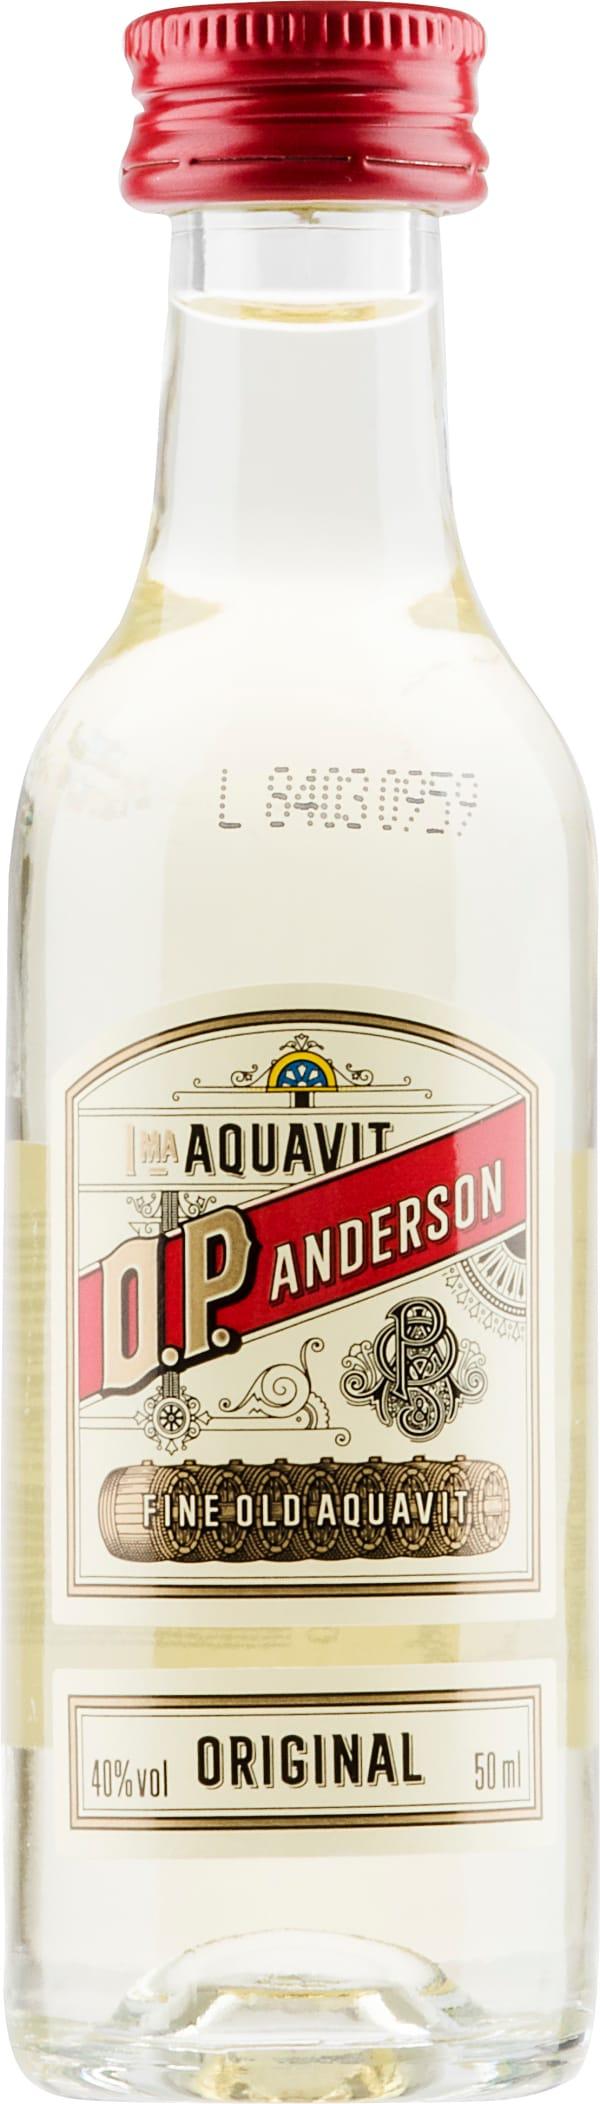 O.P. Anderson Aquavit